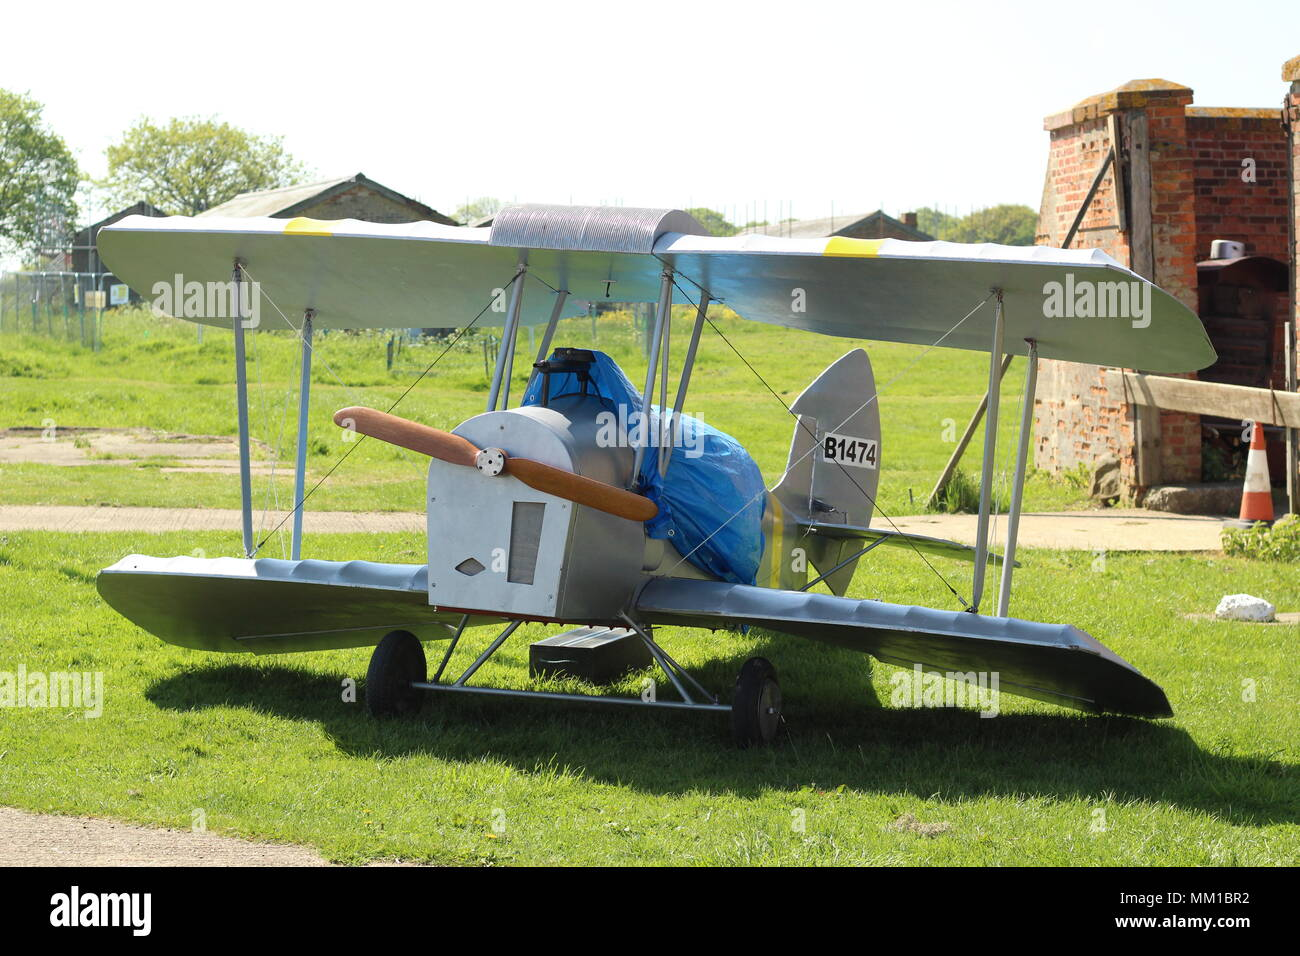 Model bi-plane at Stow Maries Great War Aerodrome, Purleigh, Essex, Britain. - Stock Image